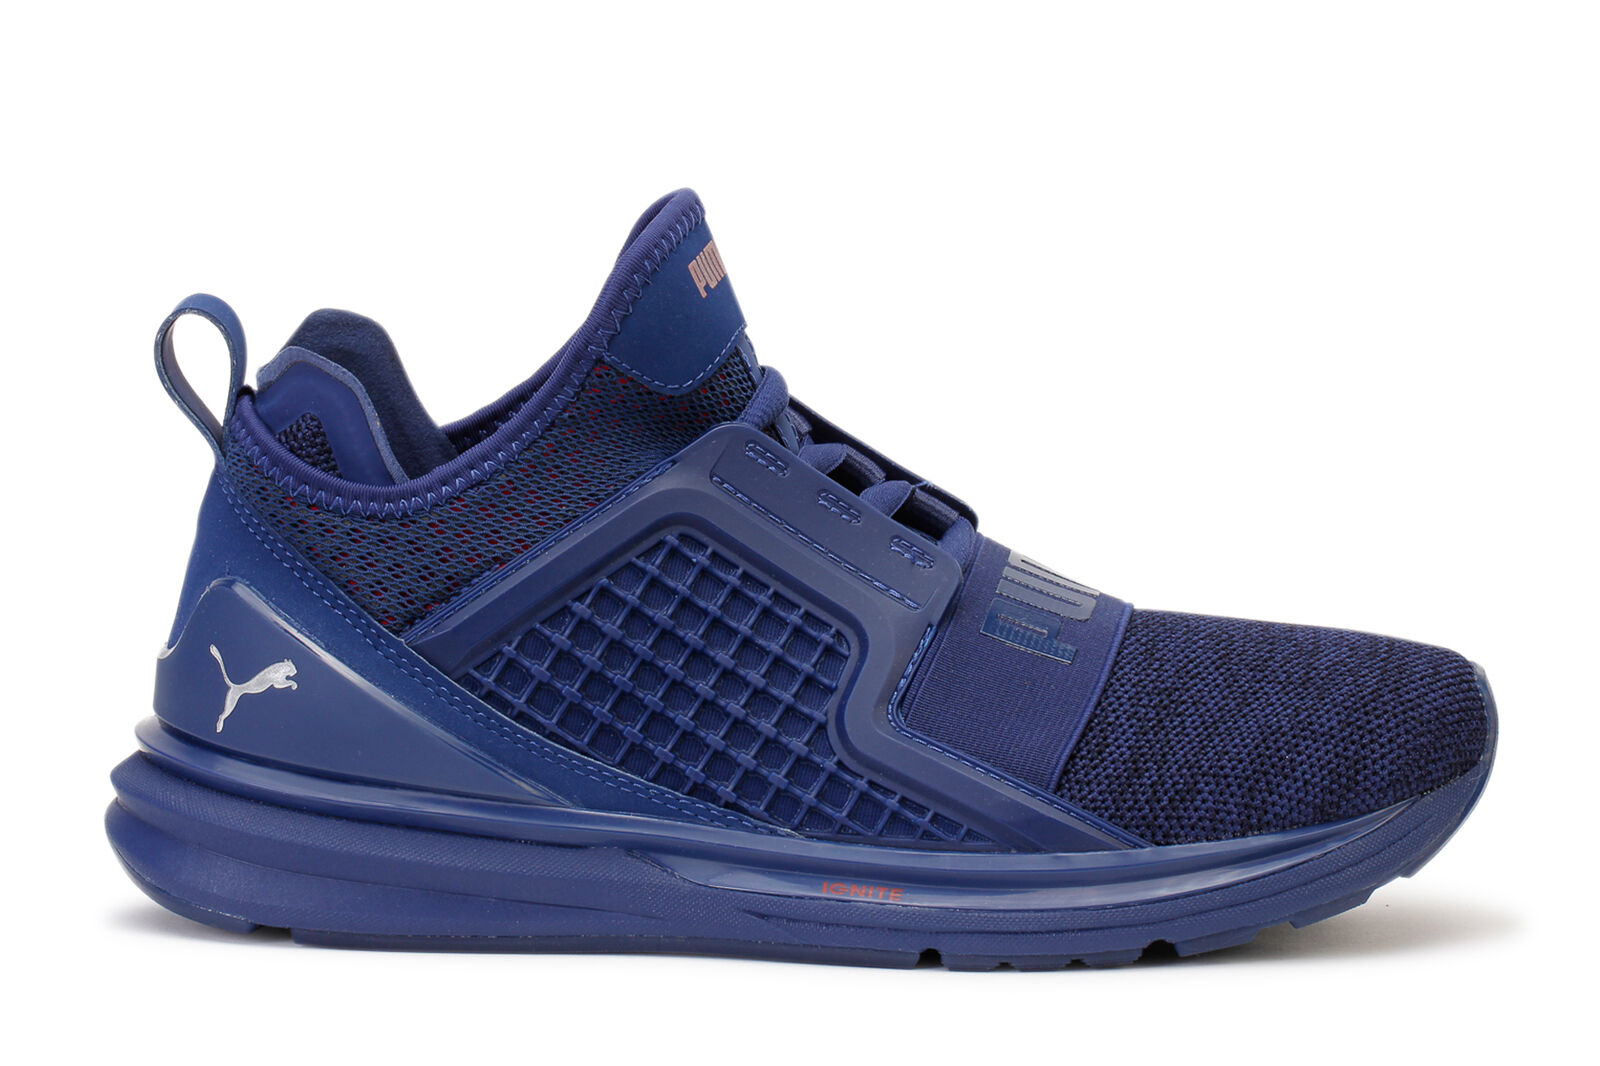 PUMA Ignite Limitless Knit Men s Training Shoes Men Low Boot Running ... 758baf4da